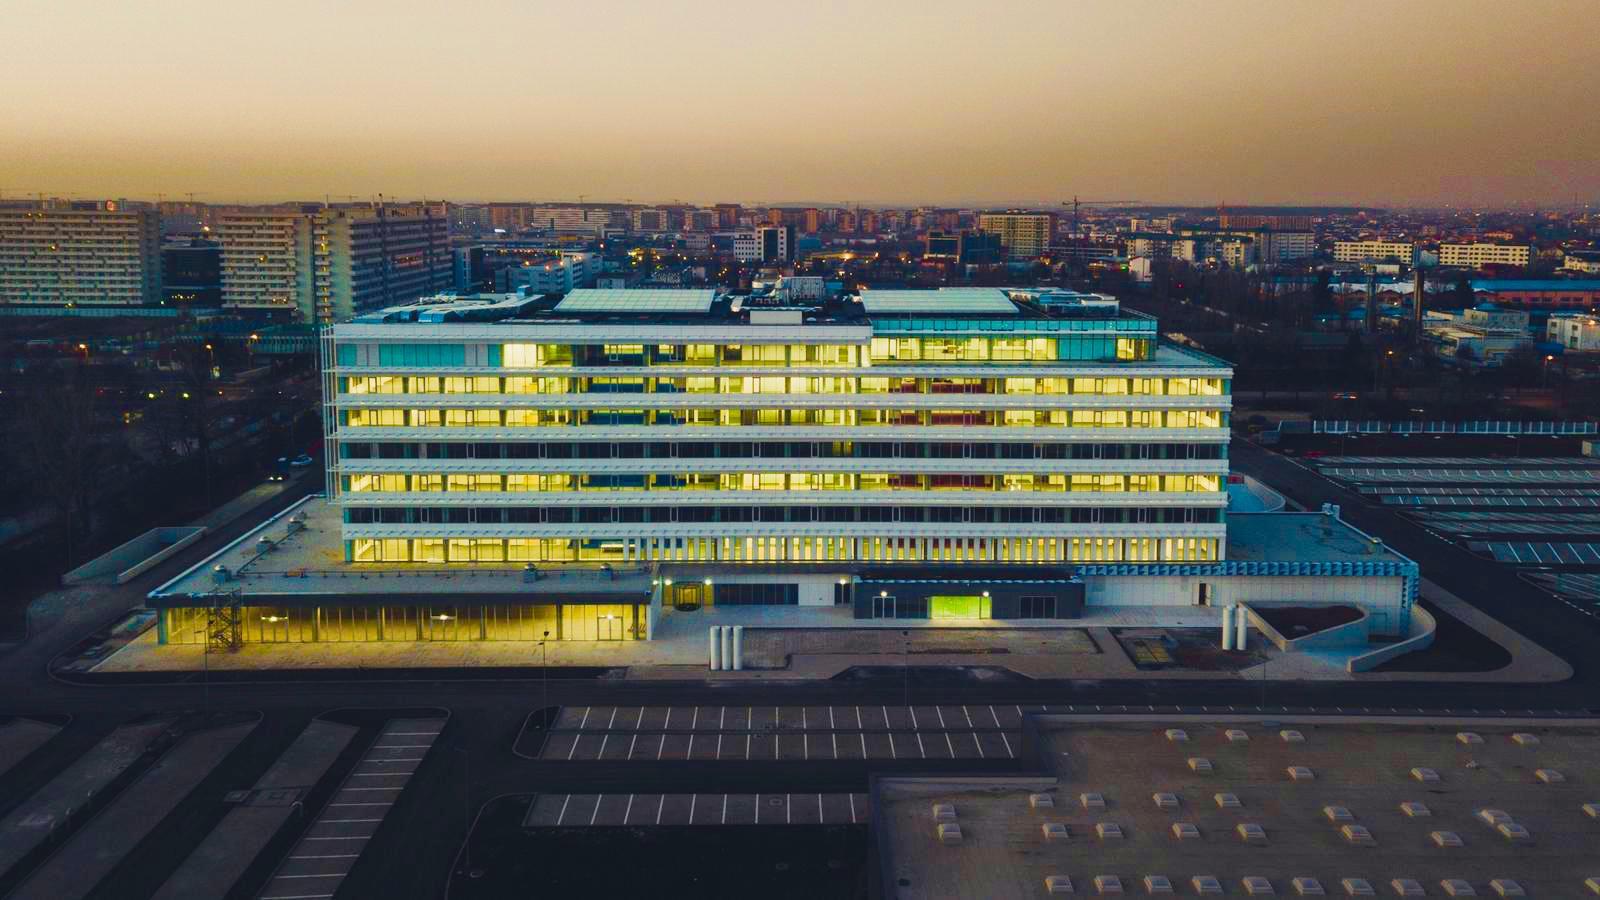 renault bucharest connected - Tranzacție: Globalworth devine unicul proprietar Renault Bucharest Connected